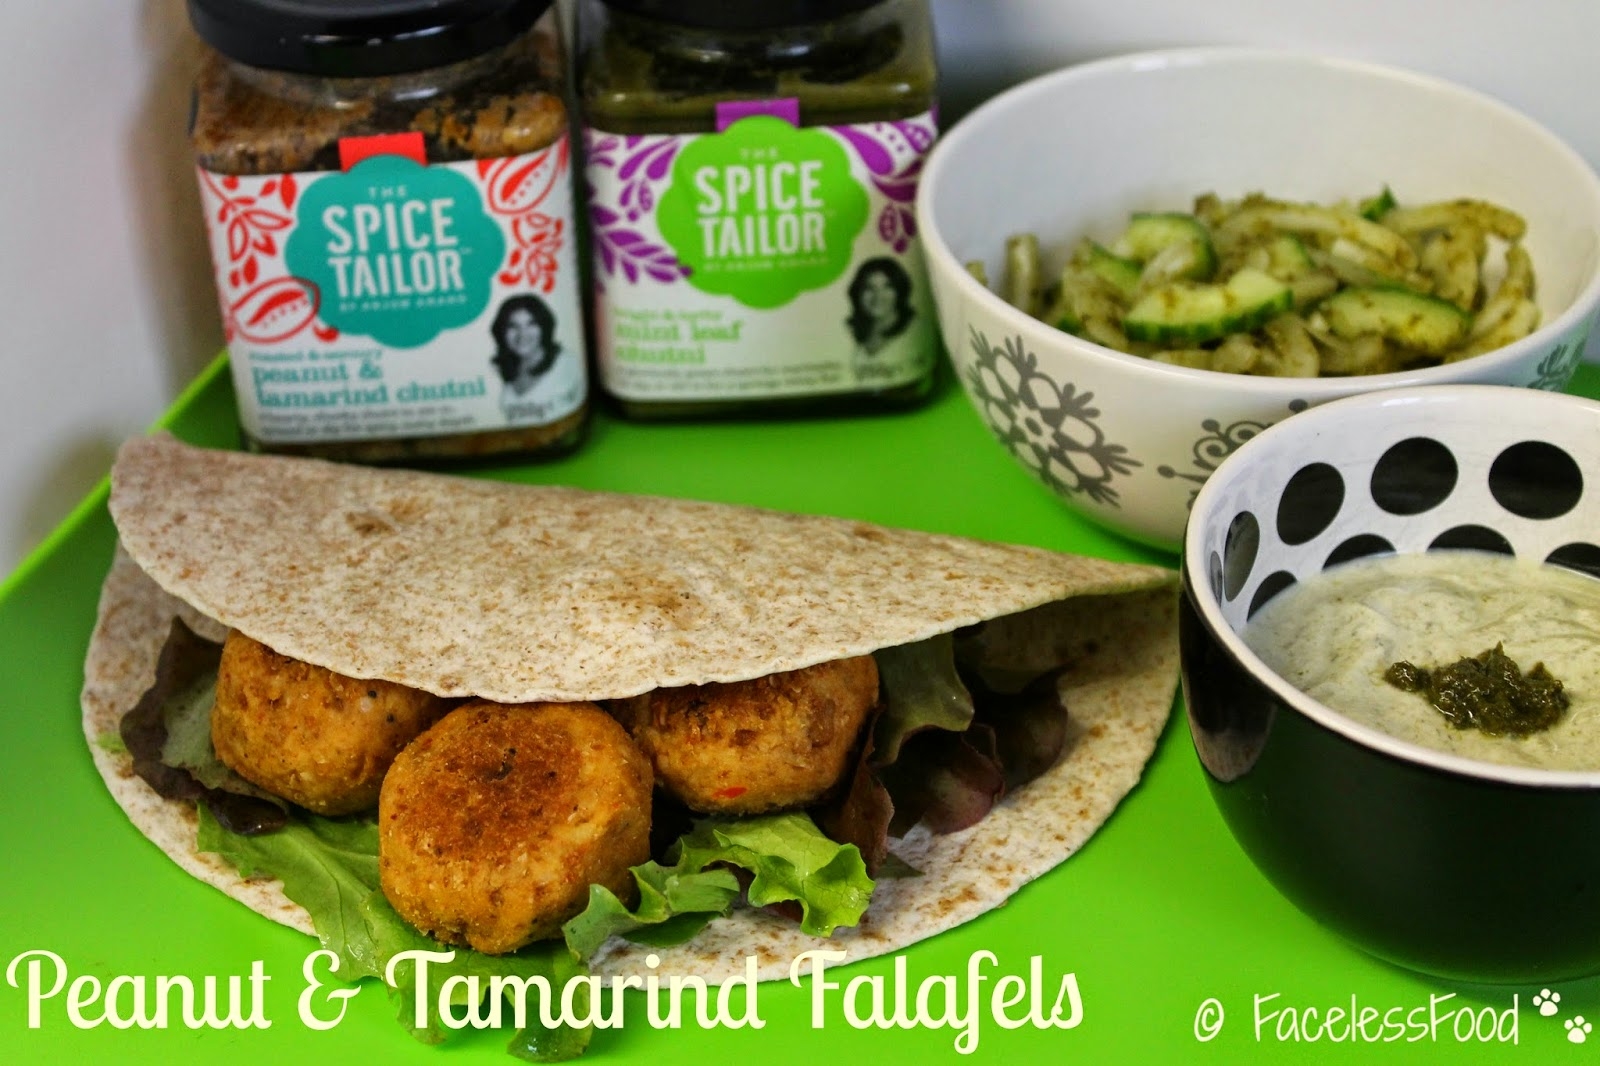 Peanut & Tamarind Falafels